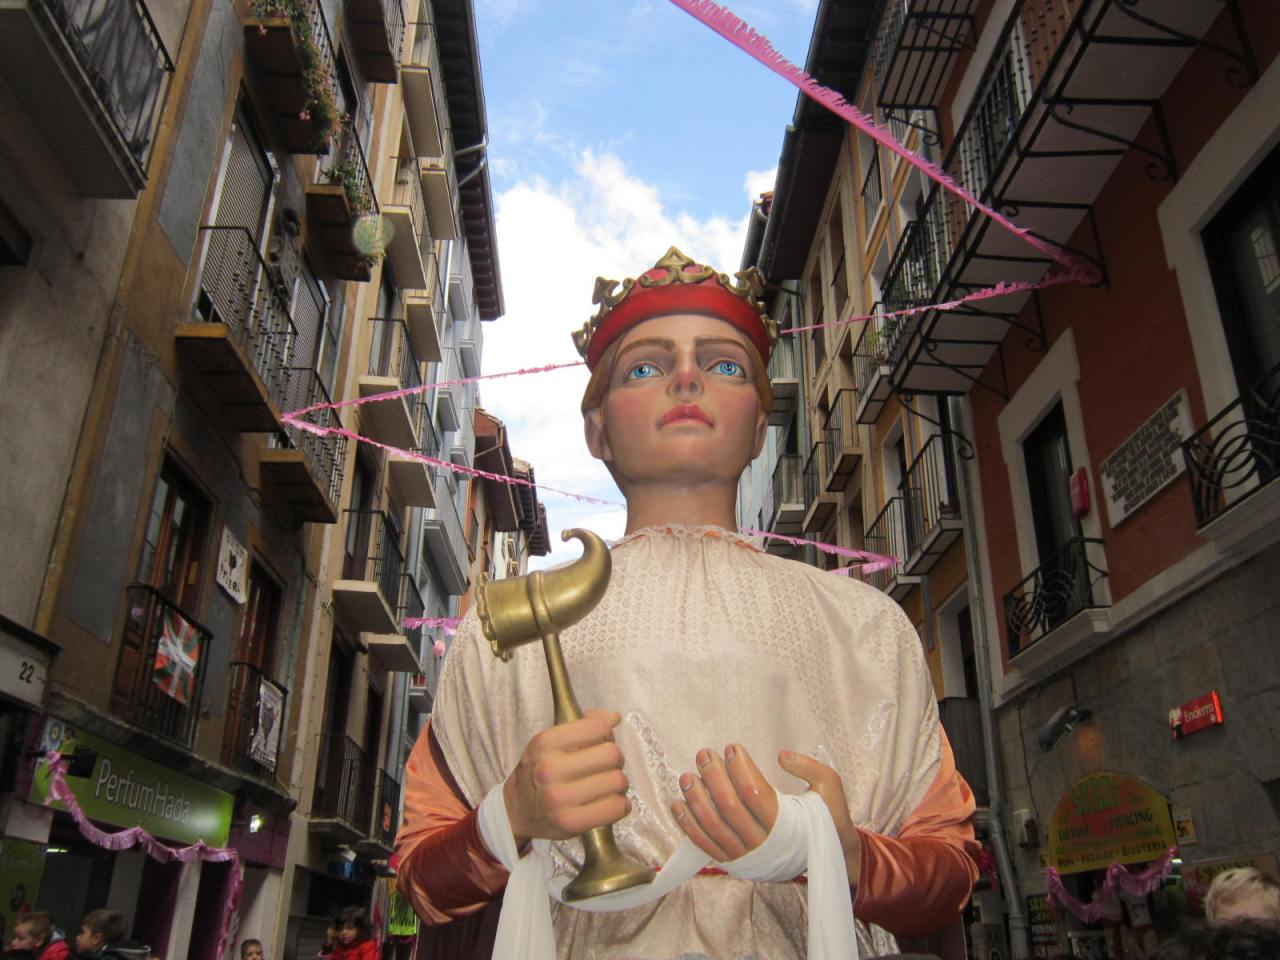 Fiesta in Pamplona